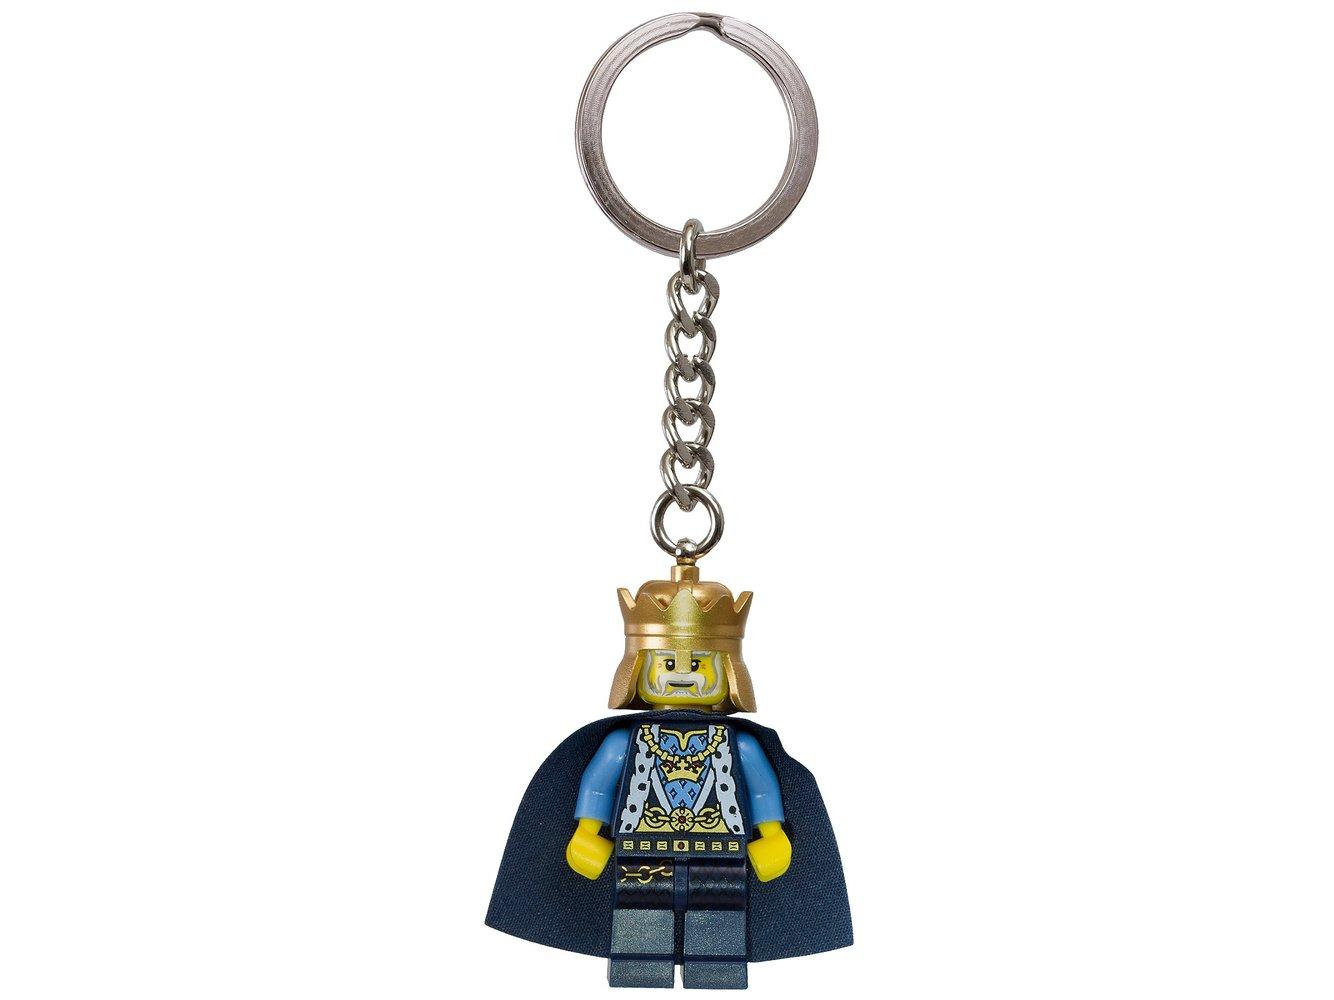 King Key Chain